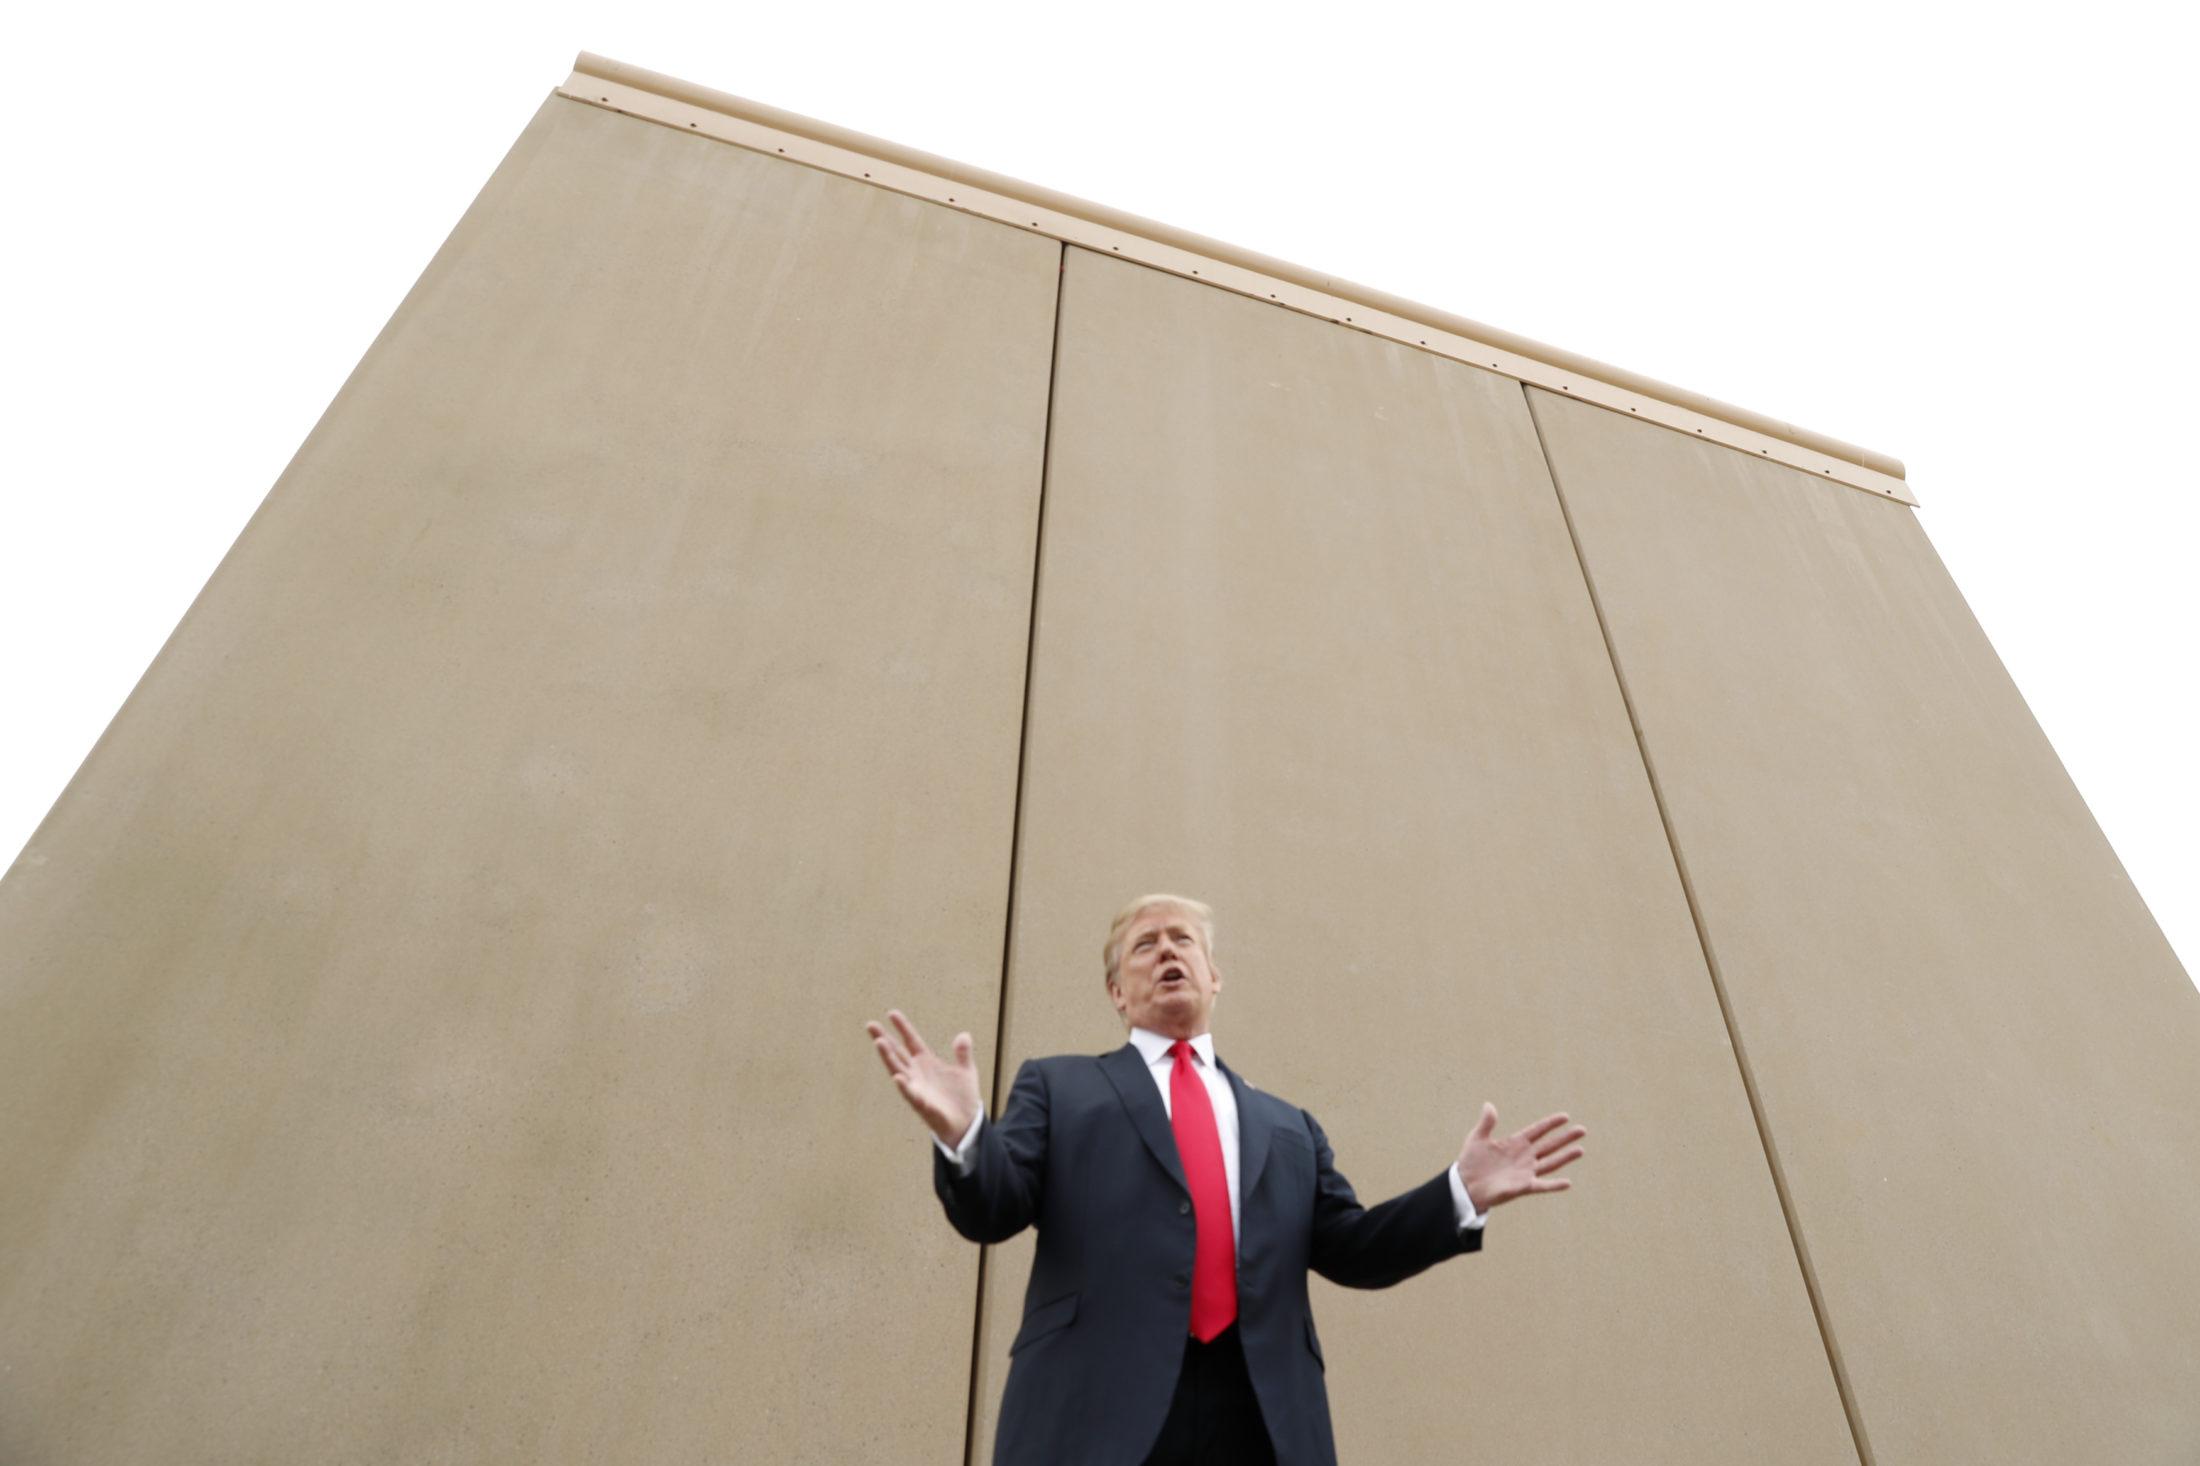 Trump administration seeks to close immigration loopholes